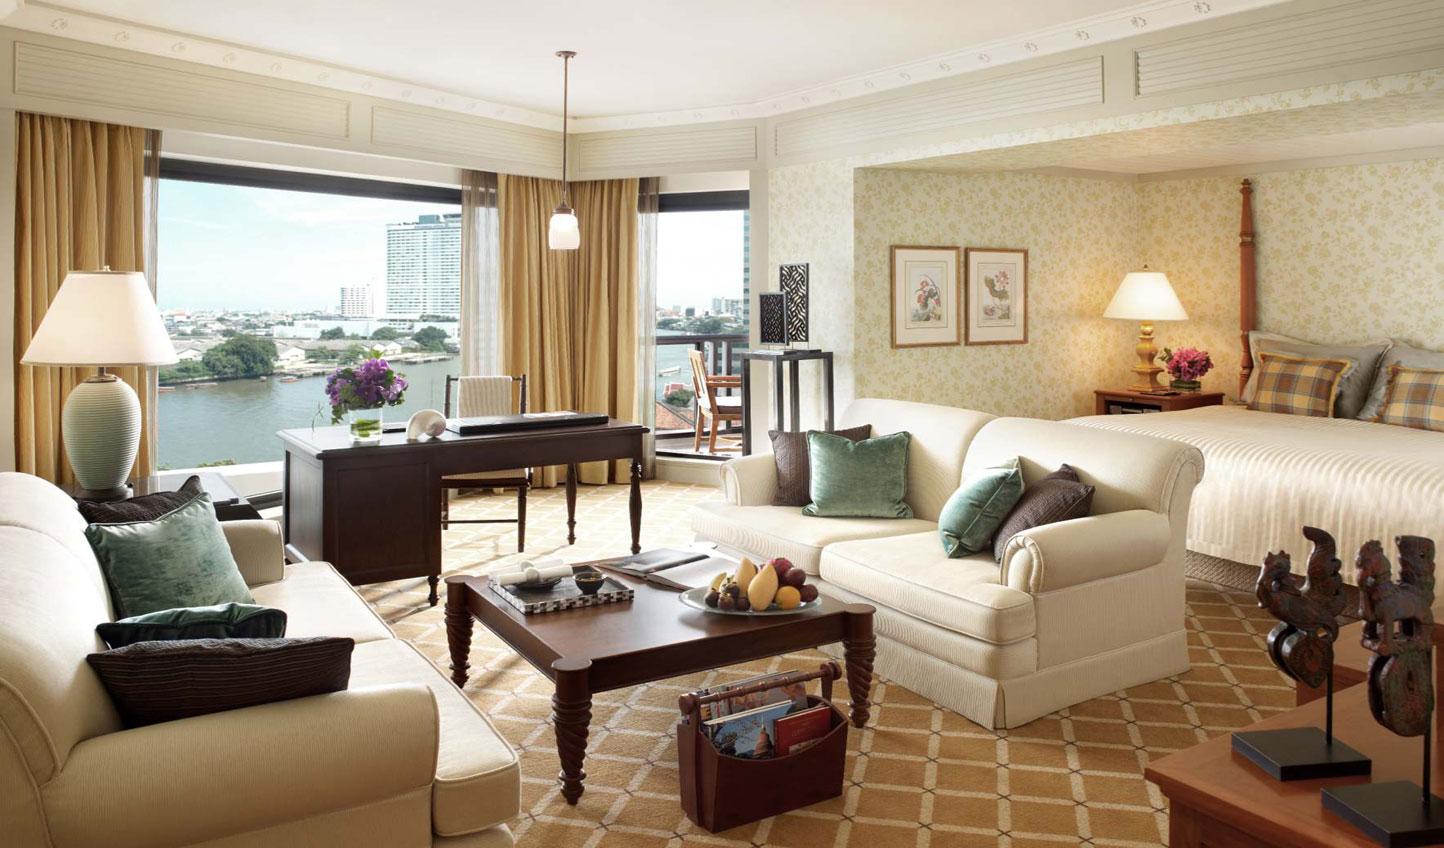 Fantastically furnished rooms